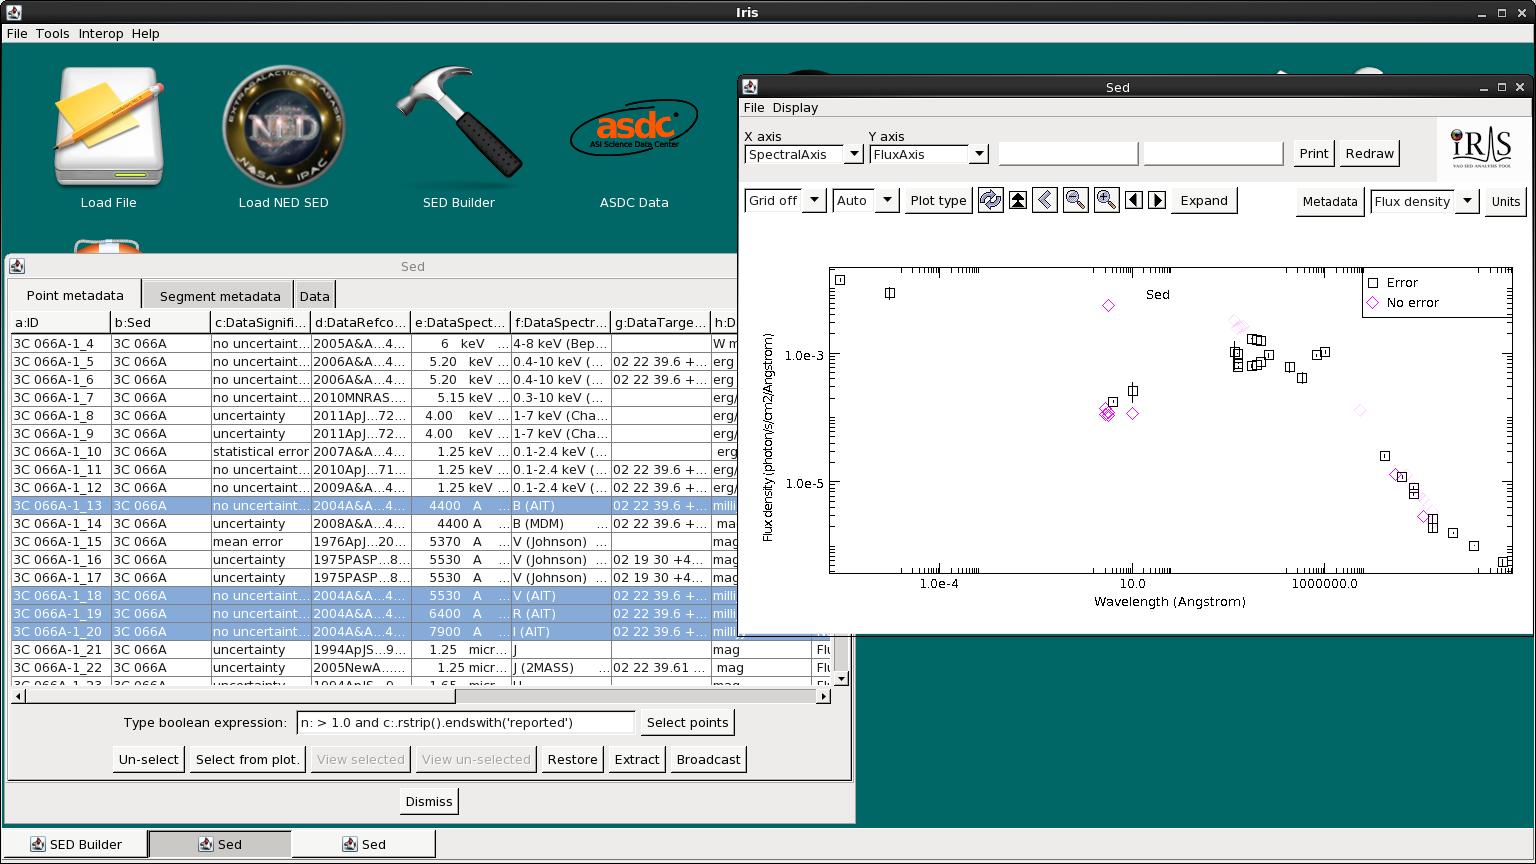 sed info Series, engine, production date mcv10r-aepgkn, 1mzfe, 08/1997-04/2001, body: sed grade: sei atm,mtm: atm product: jpp driver's position: rhd sxv10l-aemdkv, 5sfe, 08/1993-08/1996, body: sed grade: xl atm, mtm: mtm product: jpp driver's position: lhd sxv10l-aemnkv.